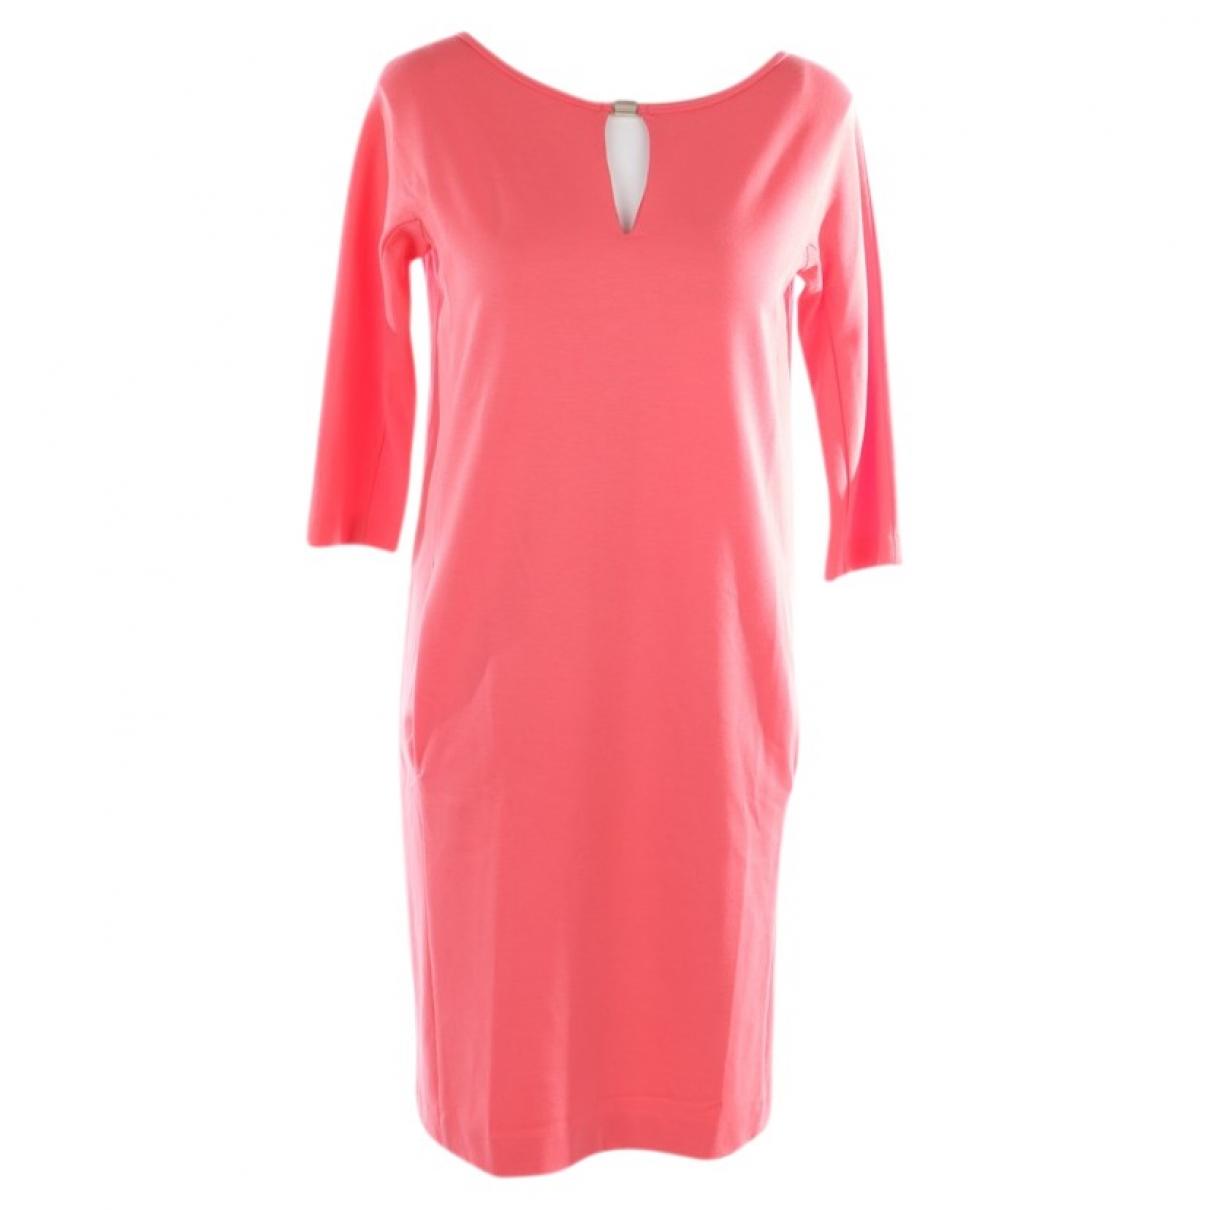 Marc Cain \N Red dress for Women 38 FR